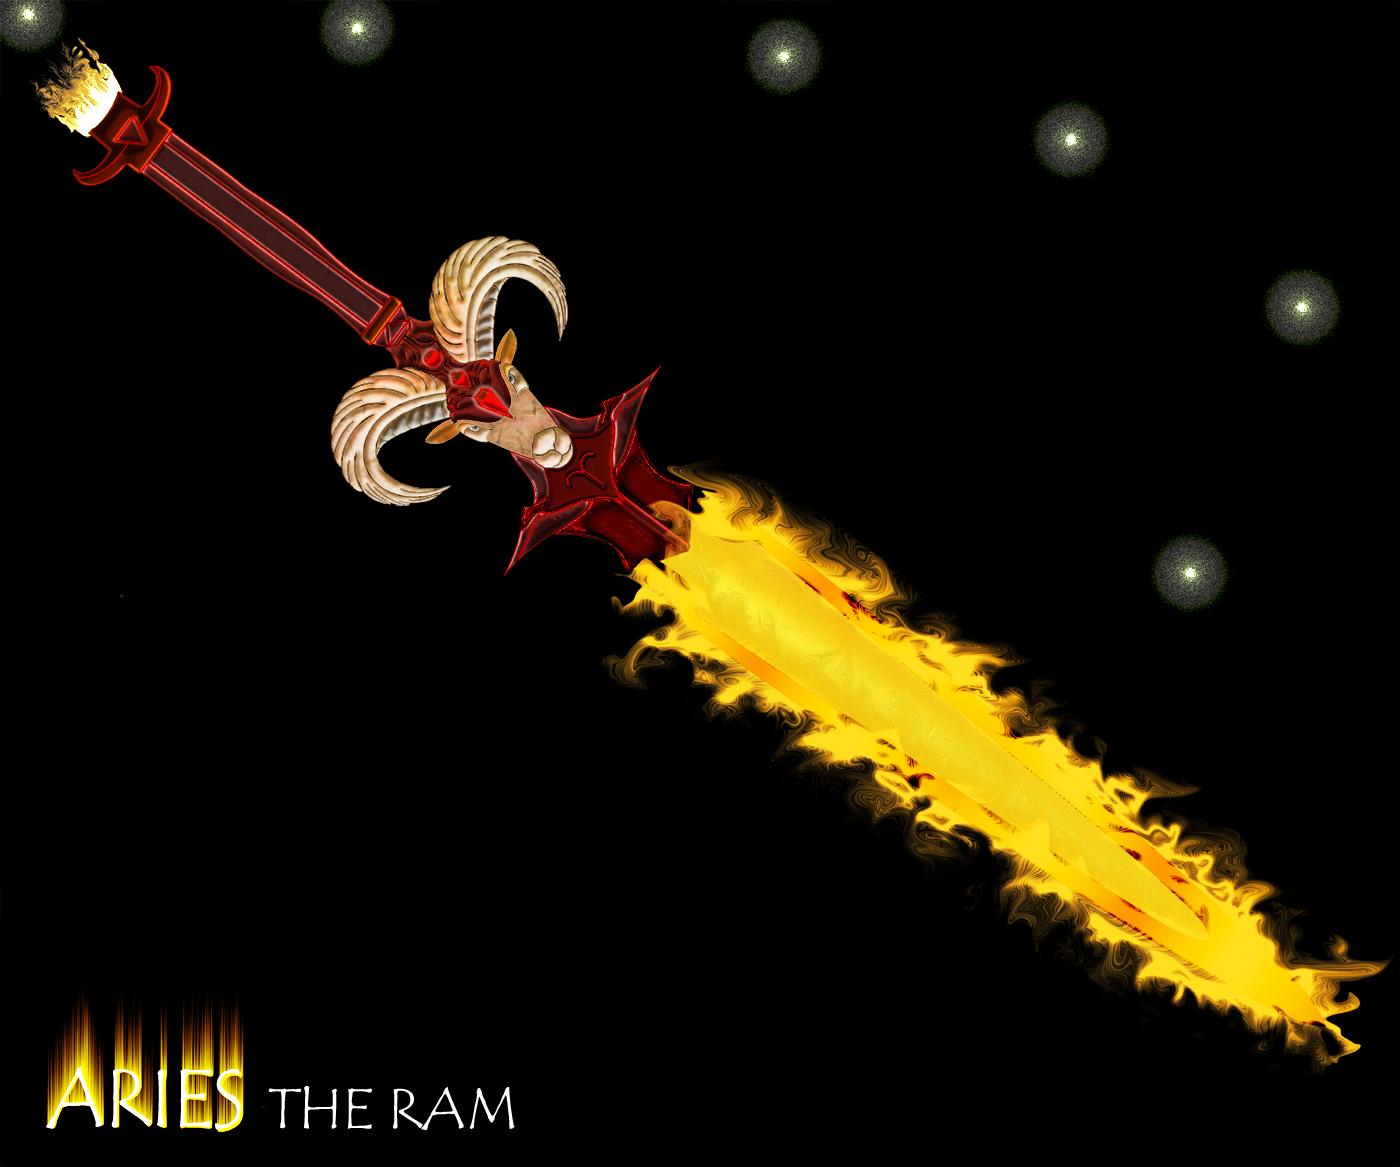 Aries The Ram by Wayanoru on DeviantArt